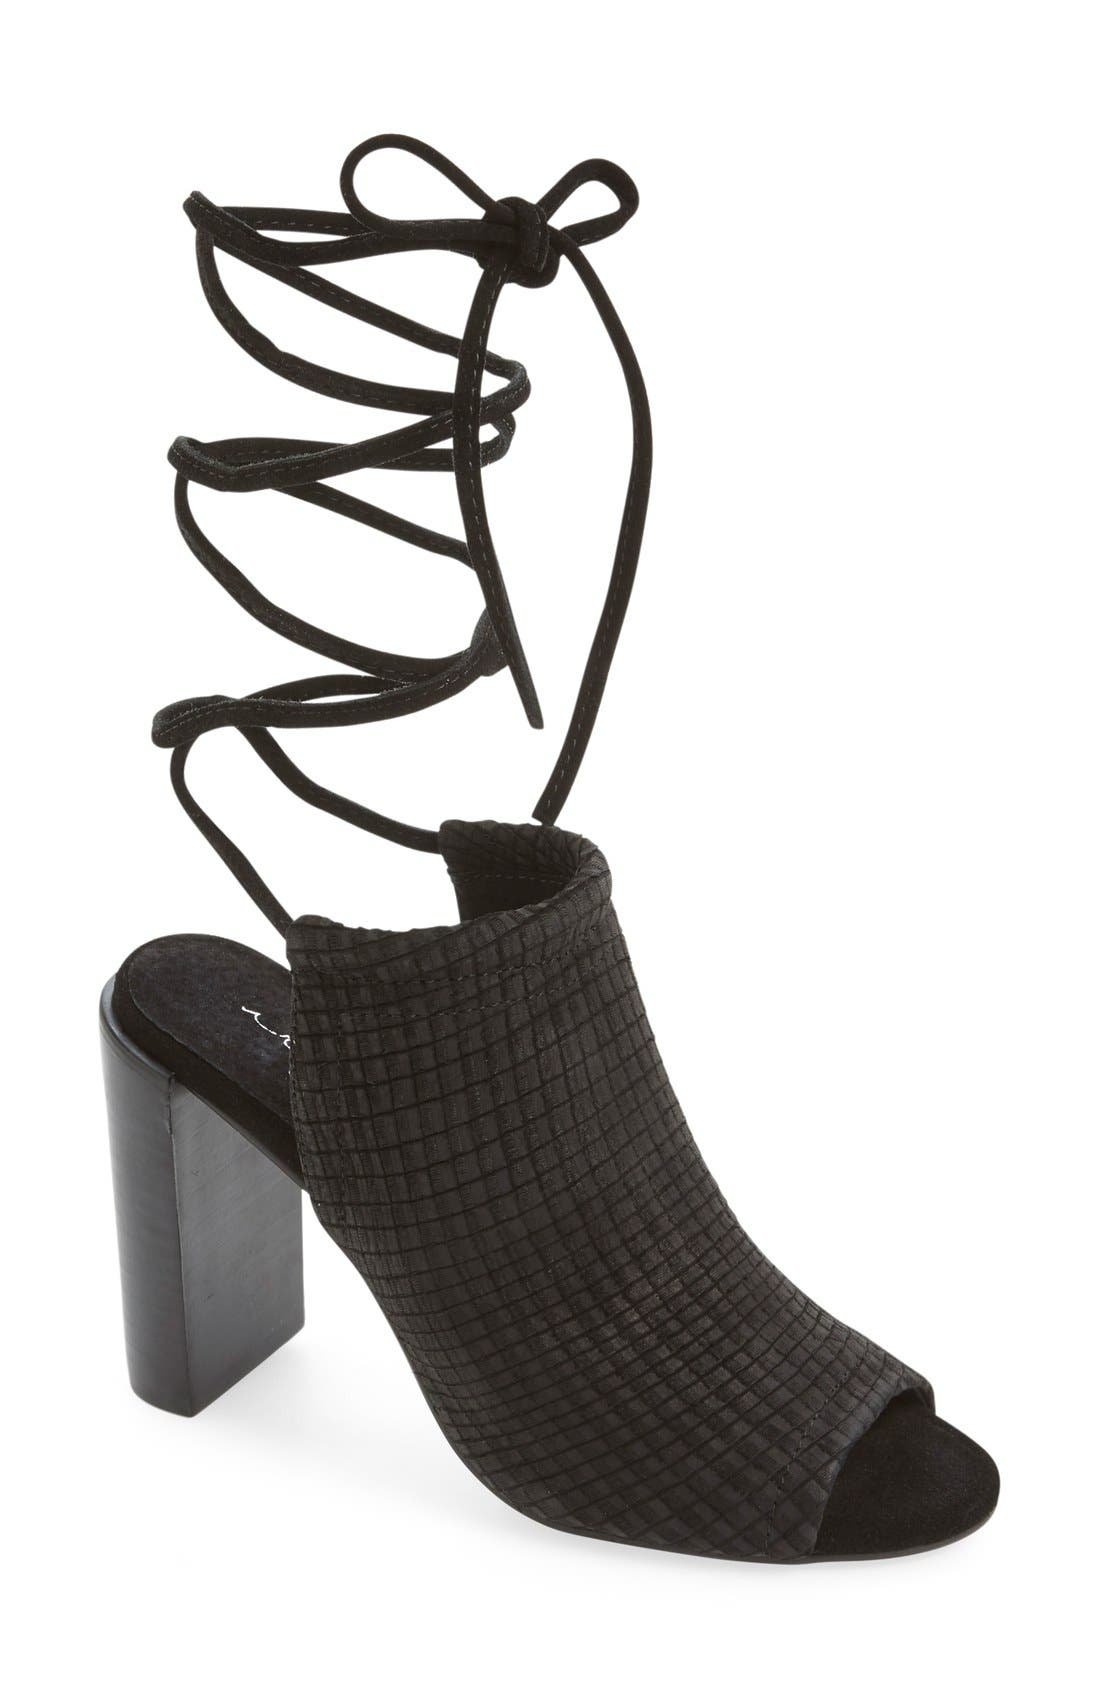 Alternate Image 1 Selected - Urge Footwear 'Eve' Lace-Up Mule Sandal (Women)